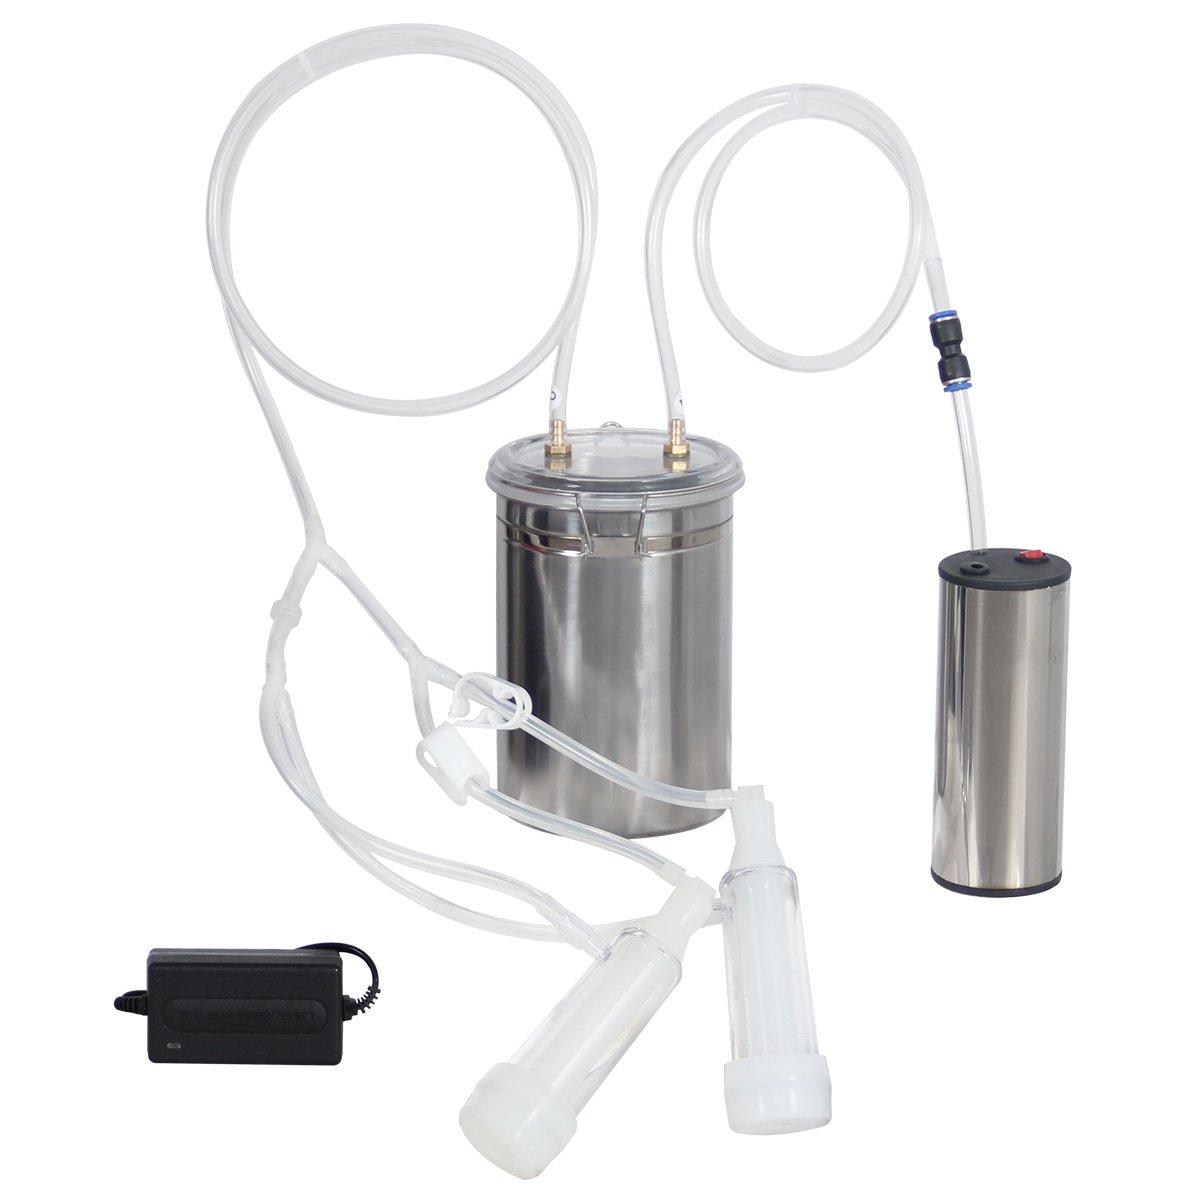 2L 0.4 Gal Goat Milker Electric Sheep Goat Milking Machine Stainless Steel Safe Food Grade Traden